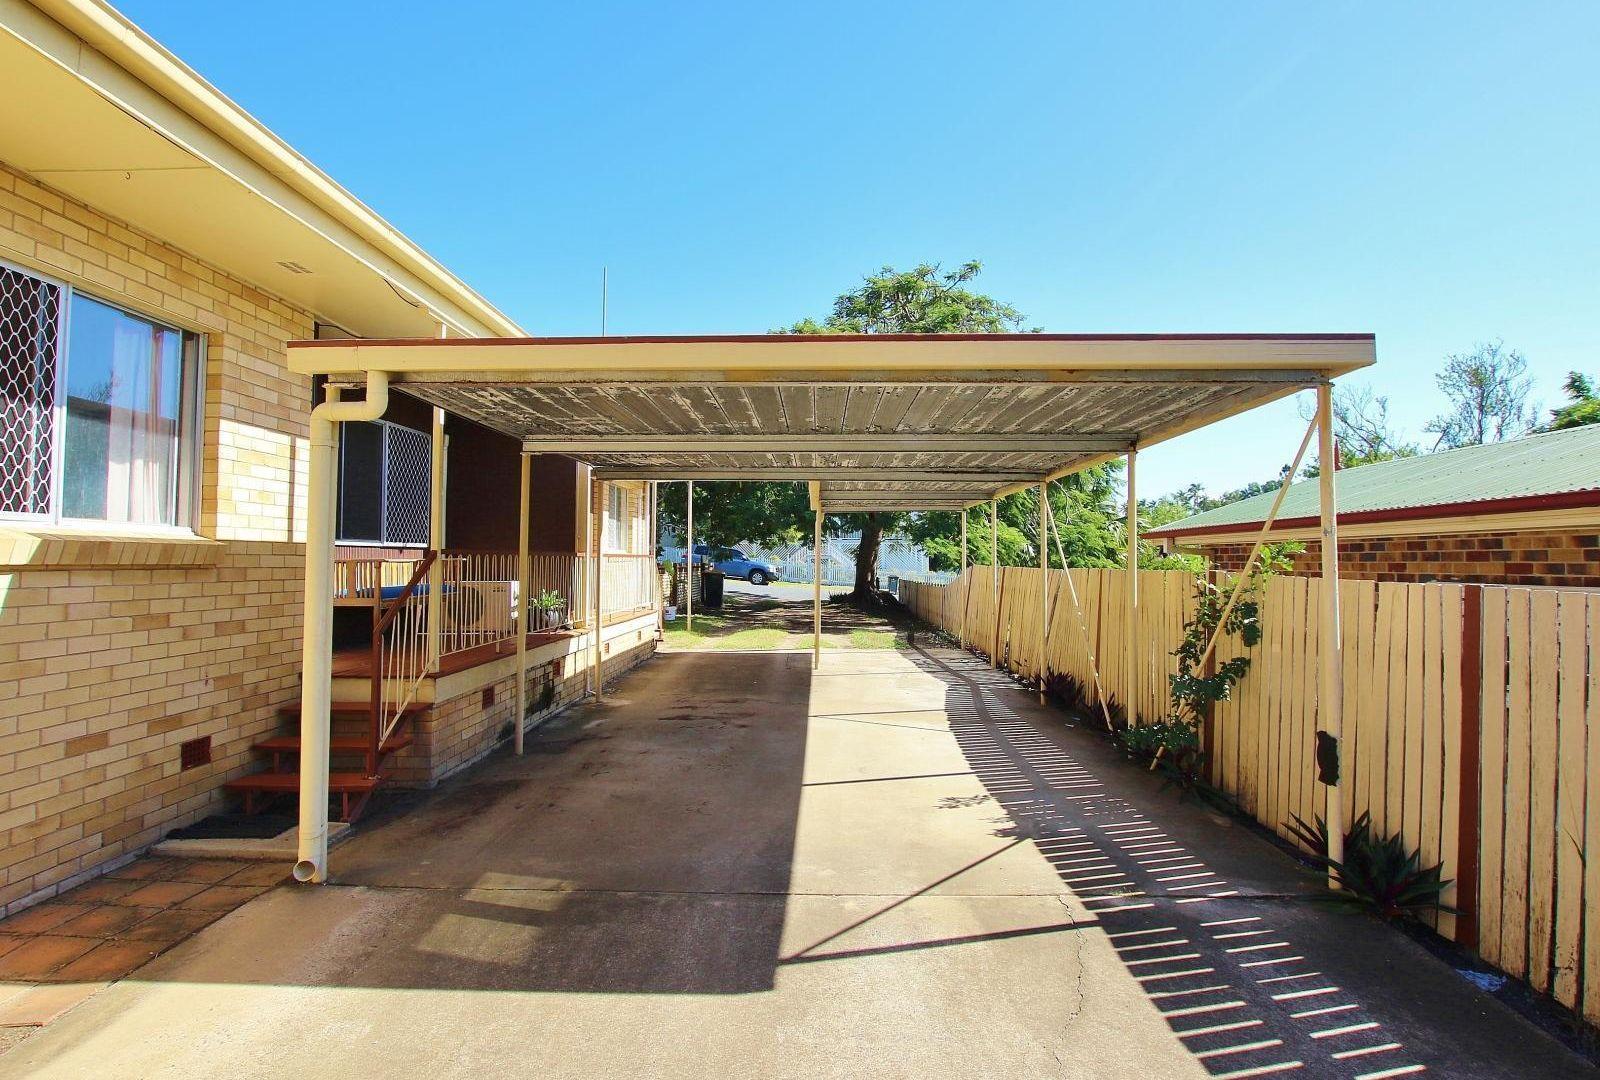 3/200 Archer Street, The Range QLD 4700, Image 1